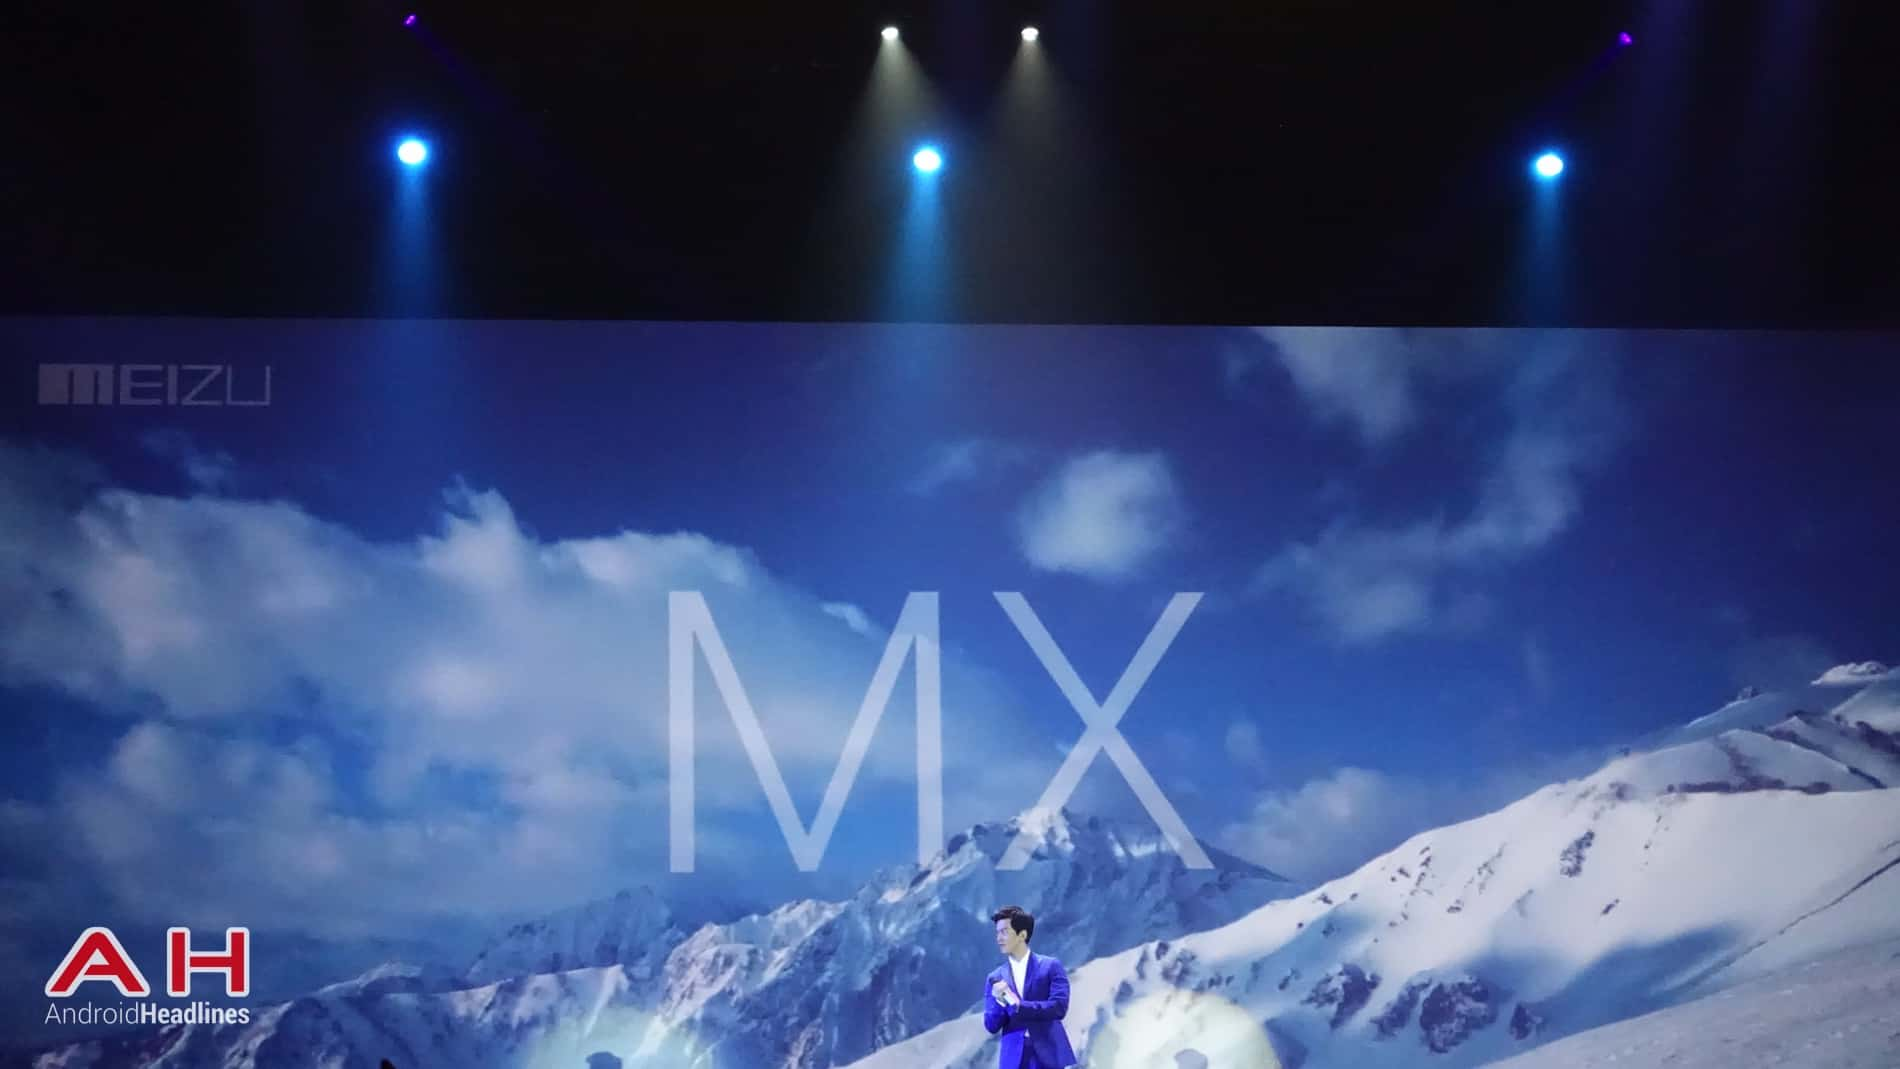 Meizu 630 MX5 AH 04